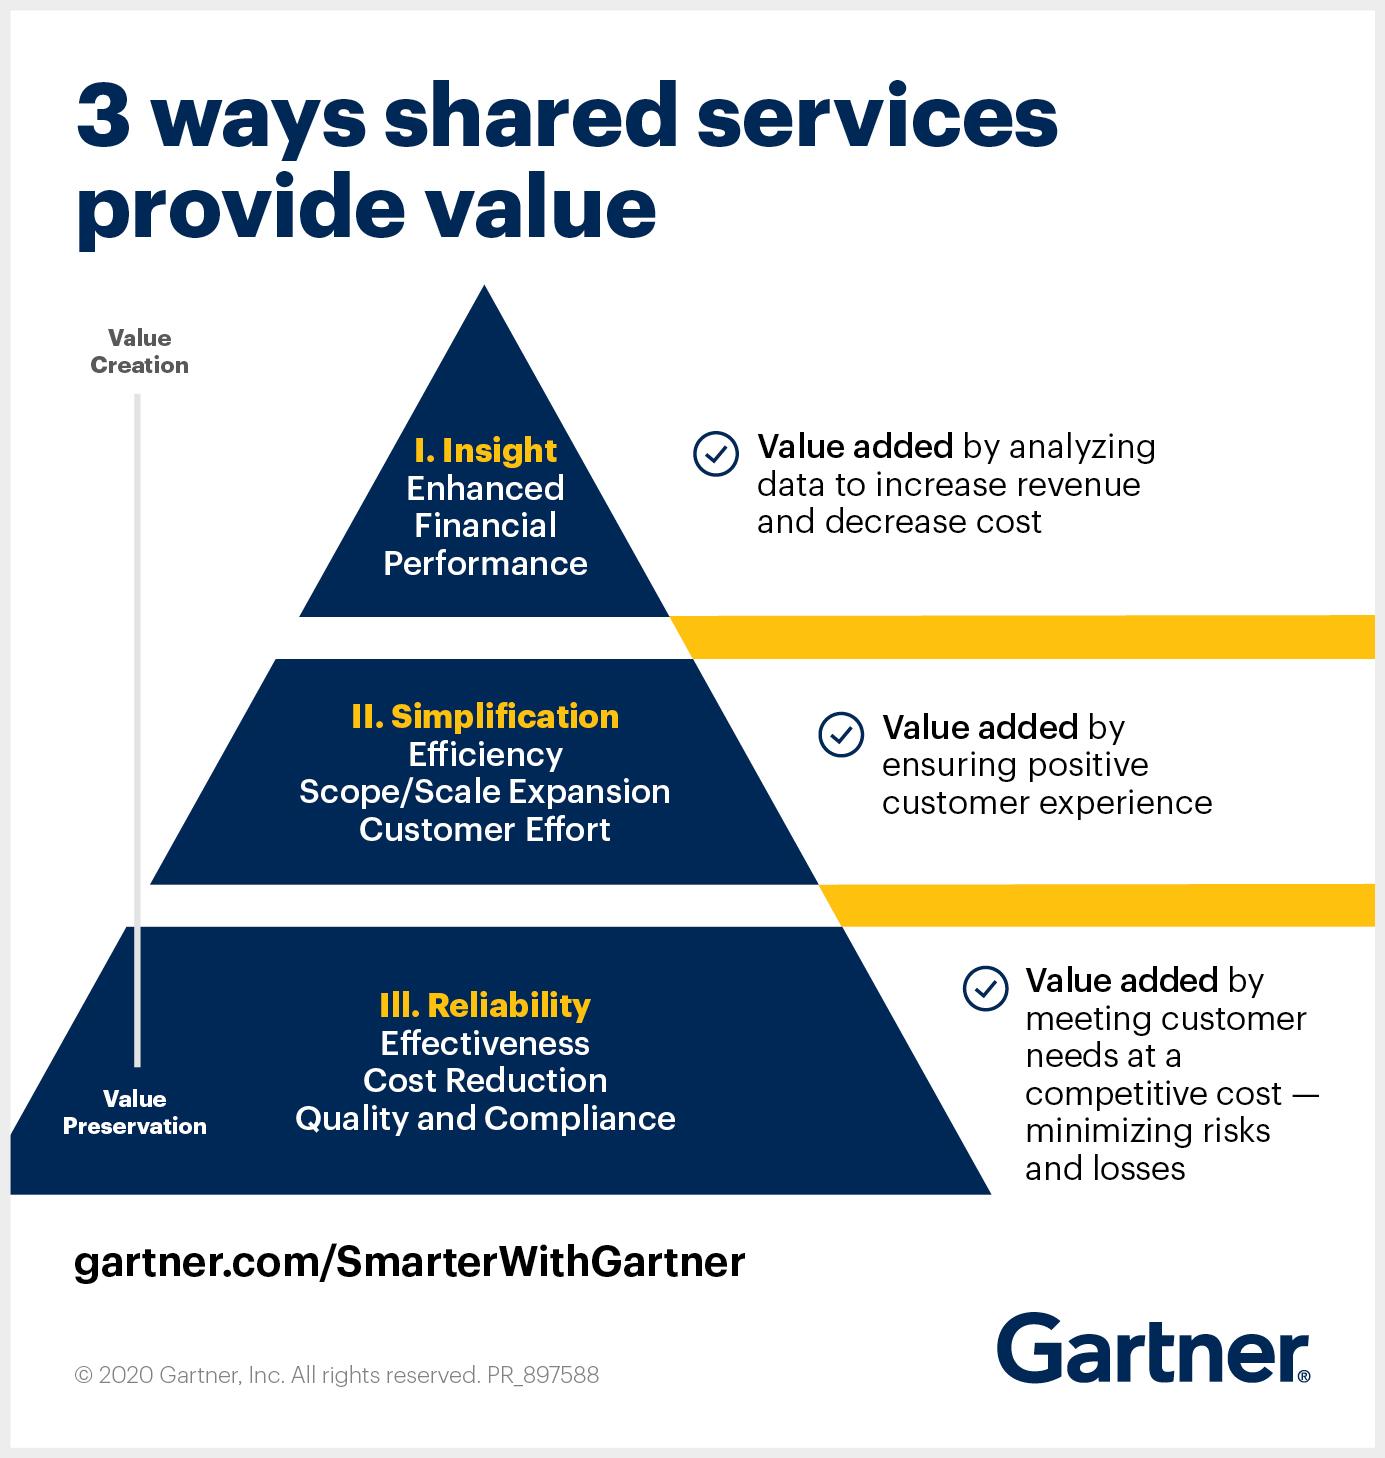 Gartner provides 3 ways shared services provide value.